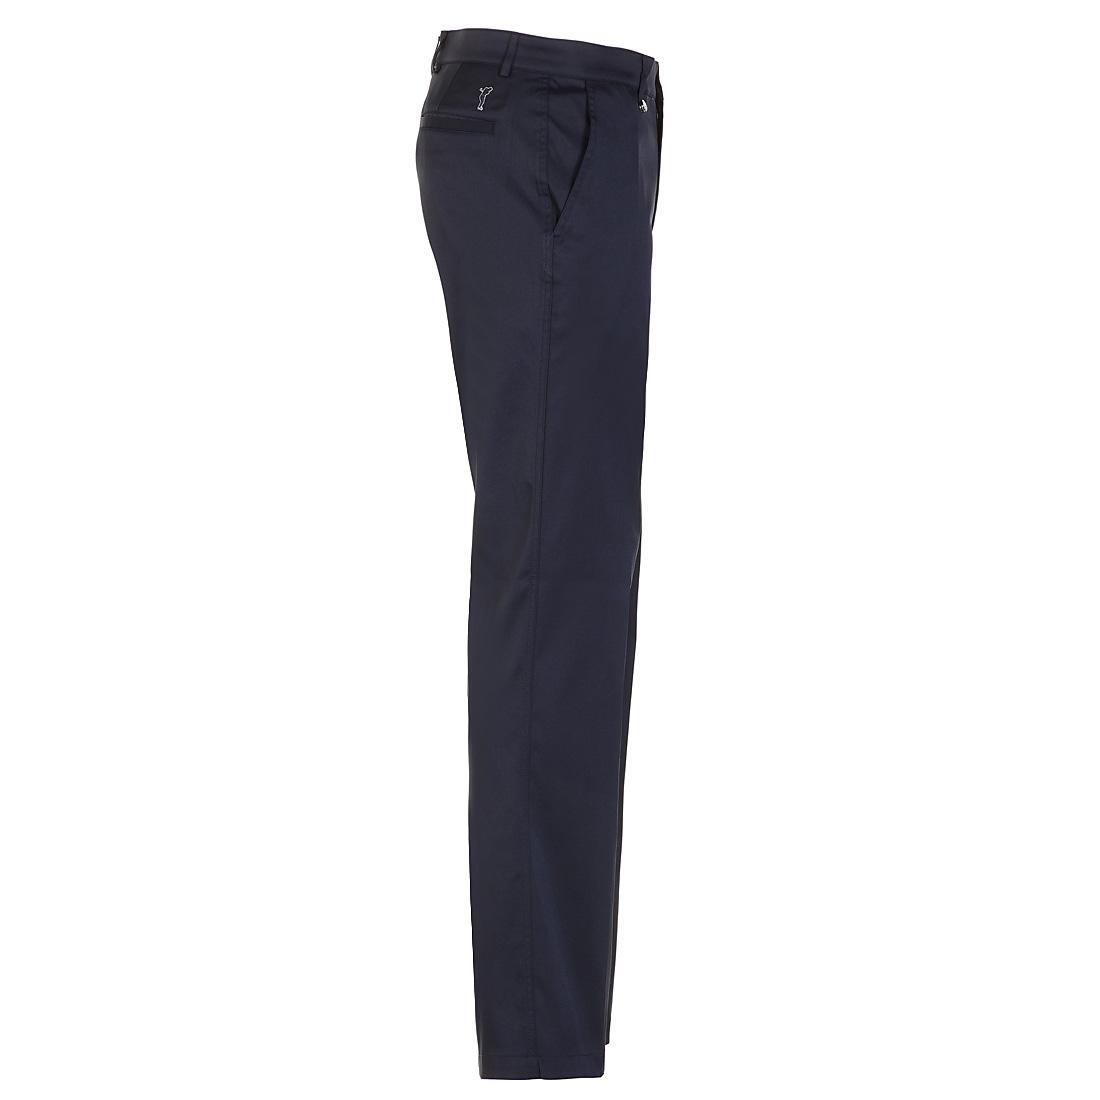 Schnelltrocknende Hose